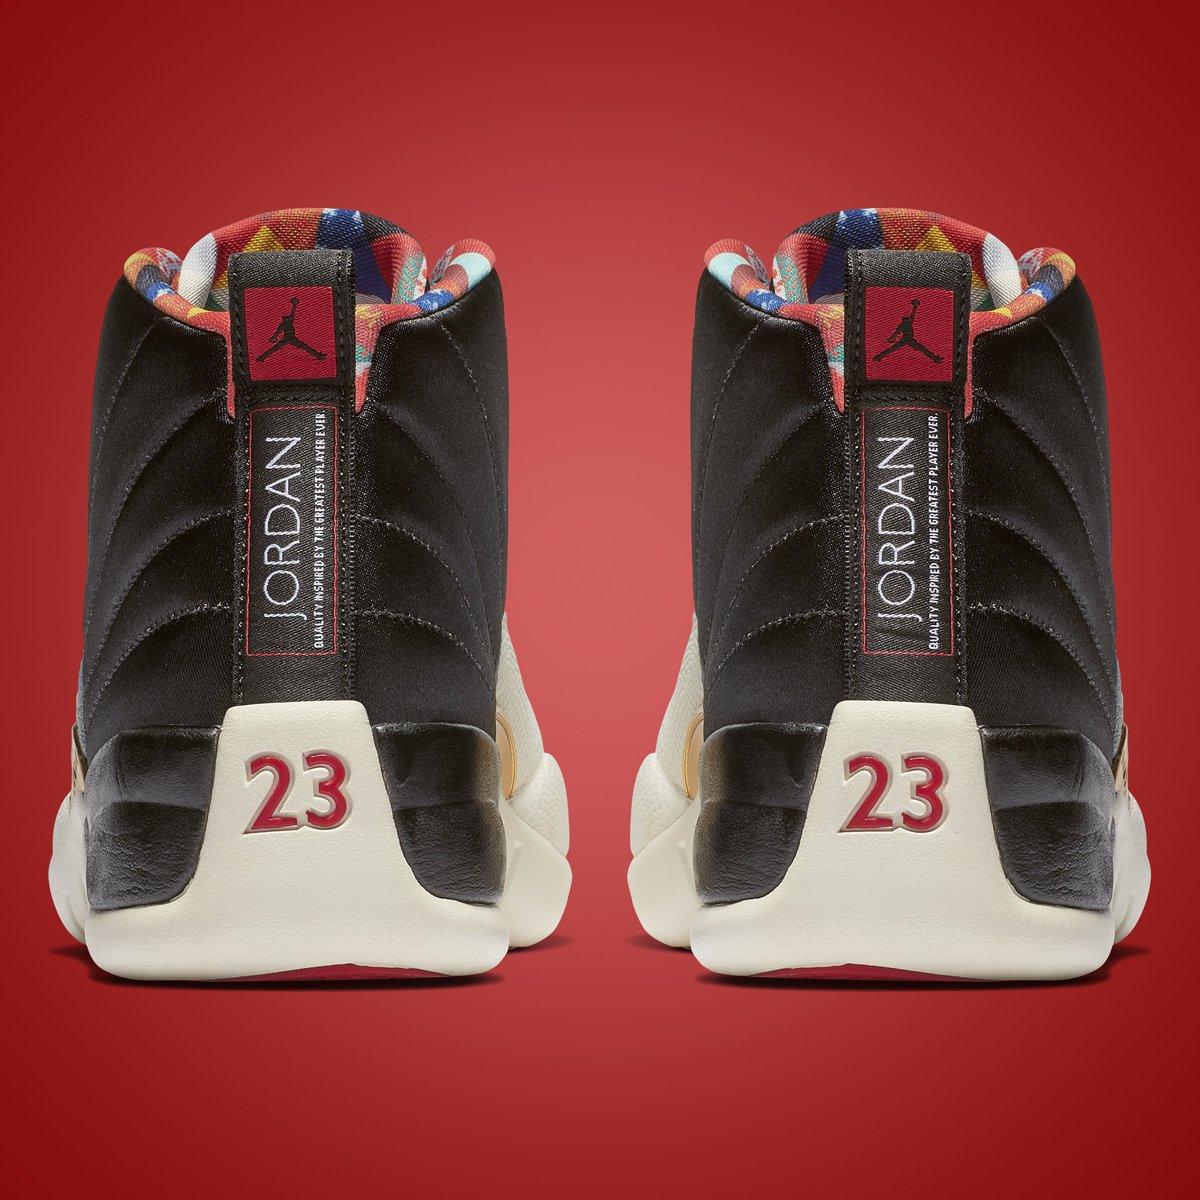 5b5869ec5a23 Air Jordan 12 Retro